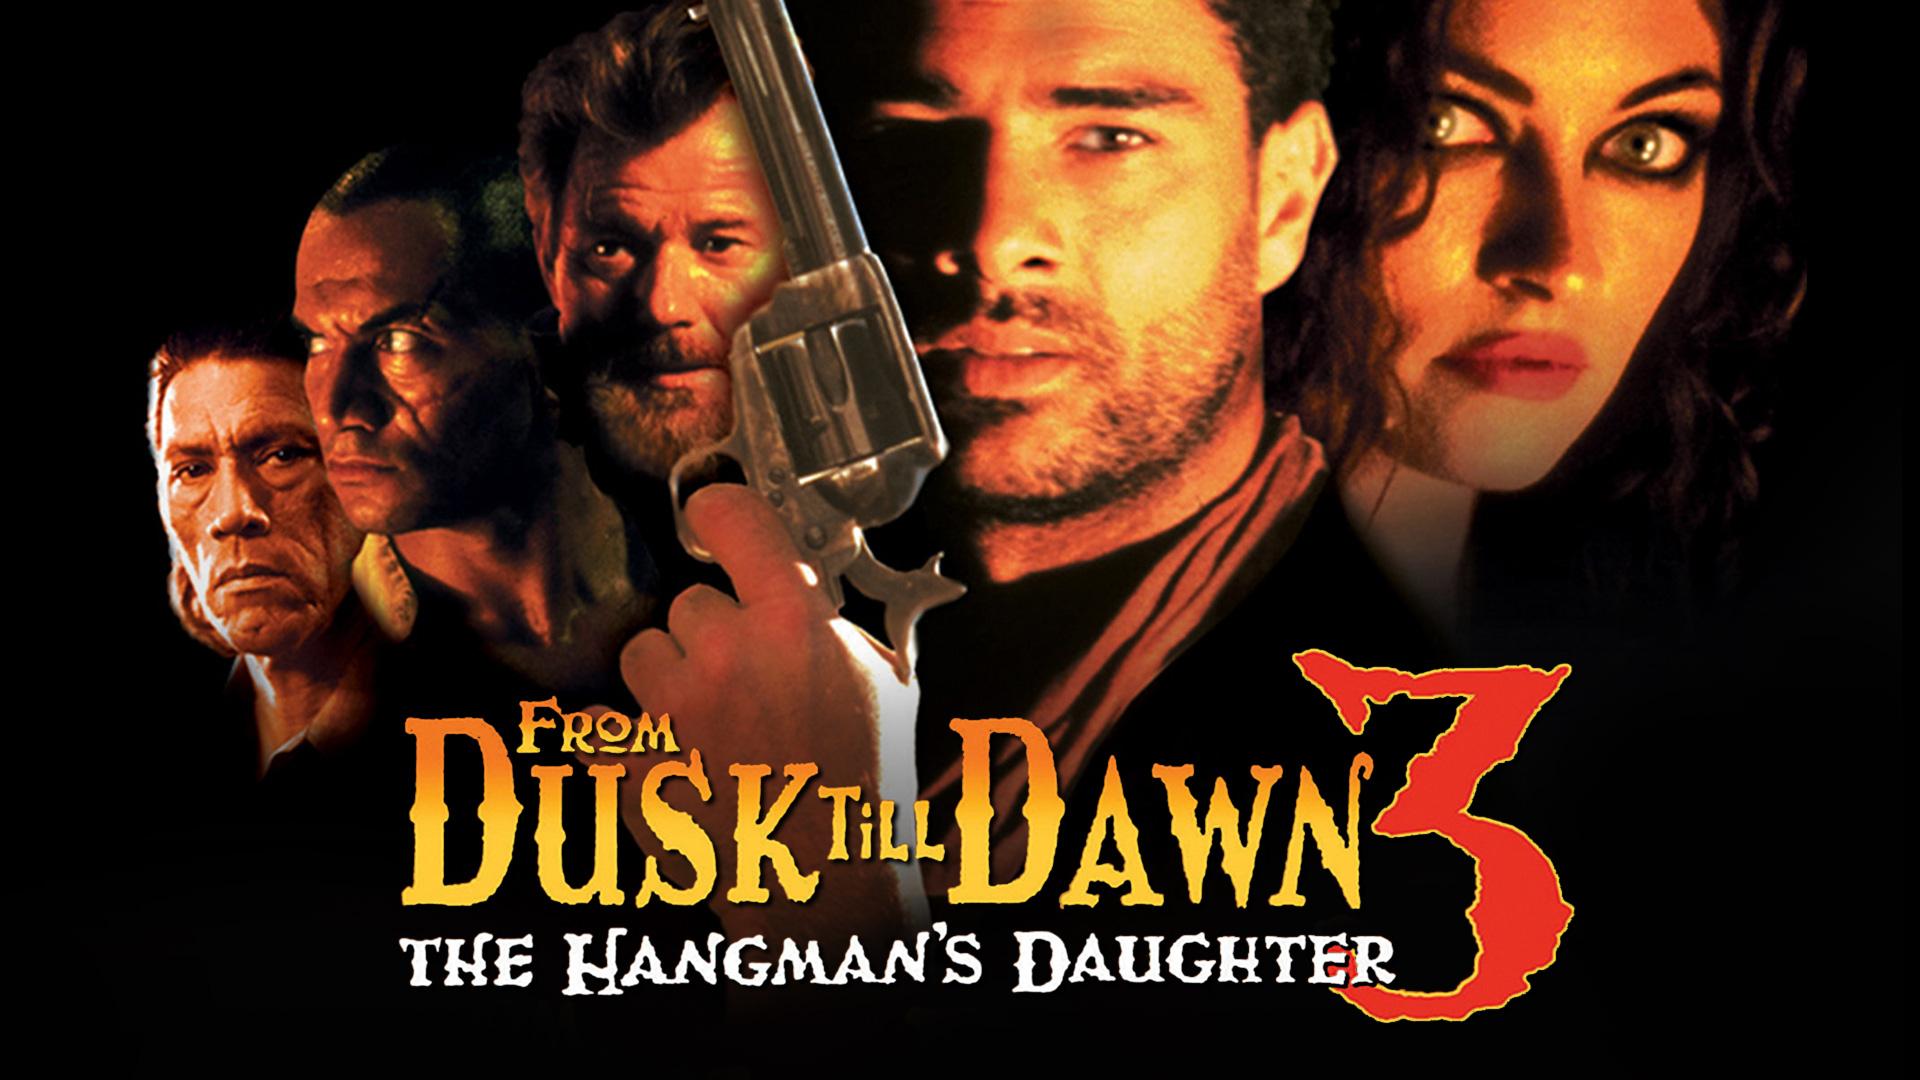 From Dusk Till Dawn III: The Hangman's Daughter